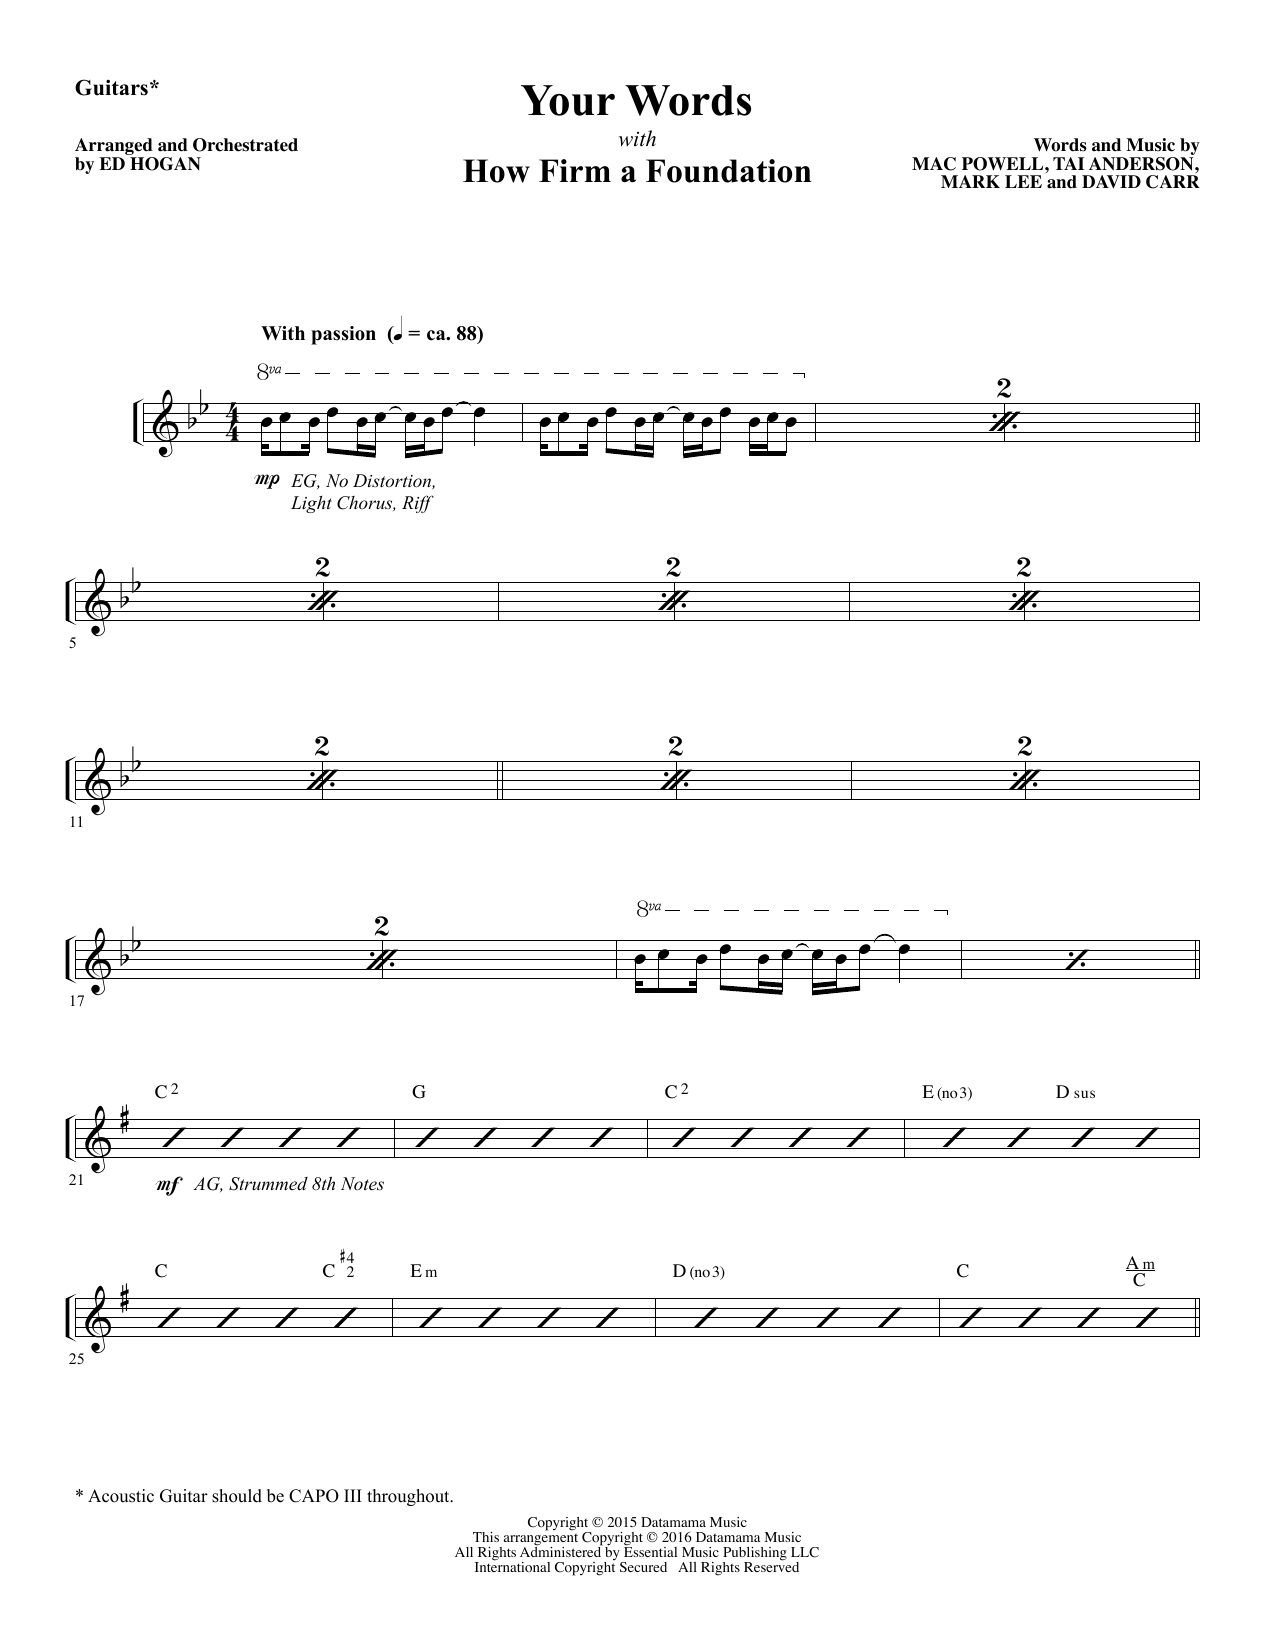 Mark Lee - Your Words - Guitars 1 & 2